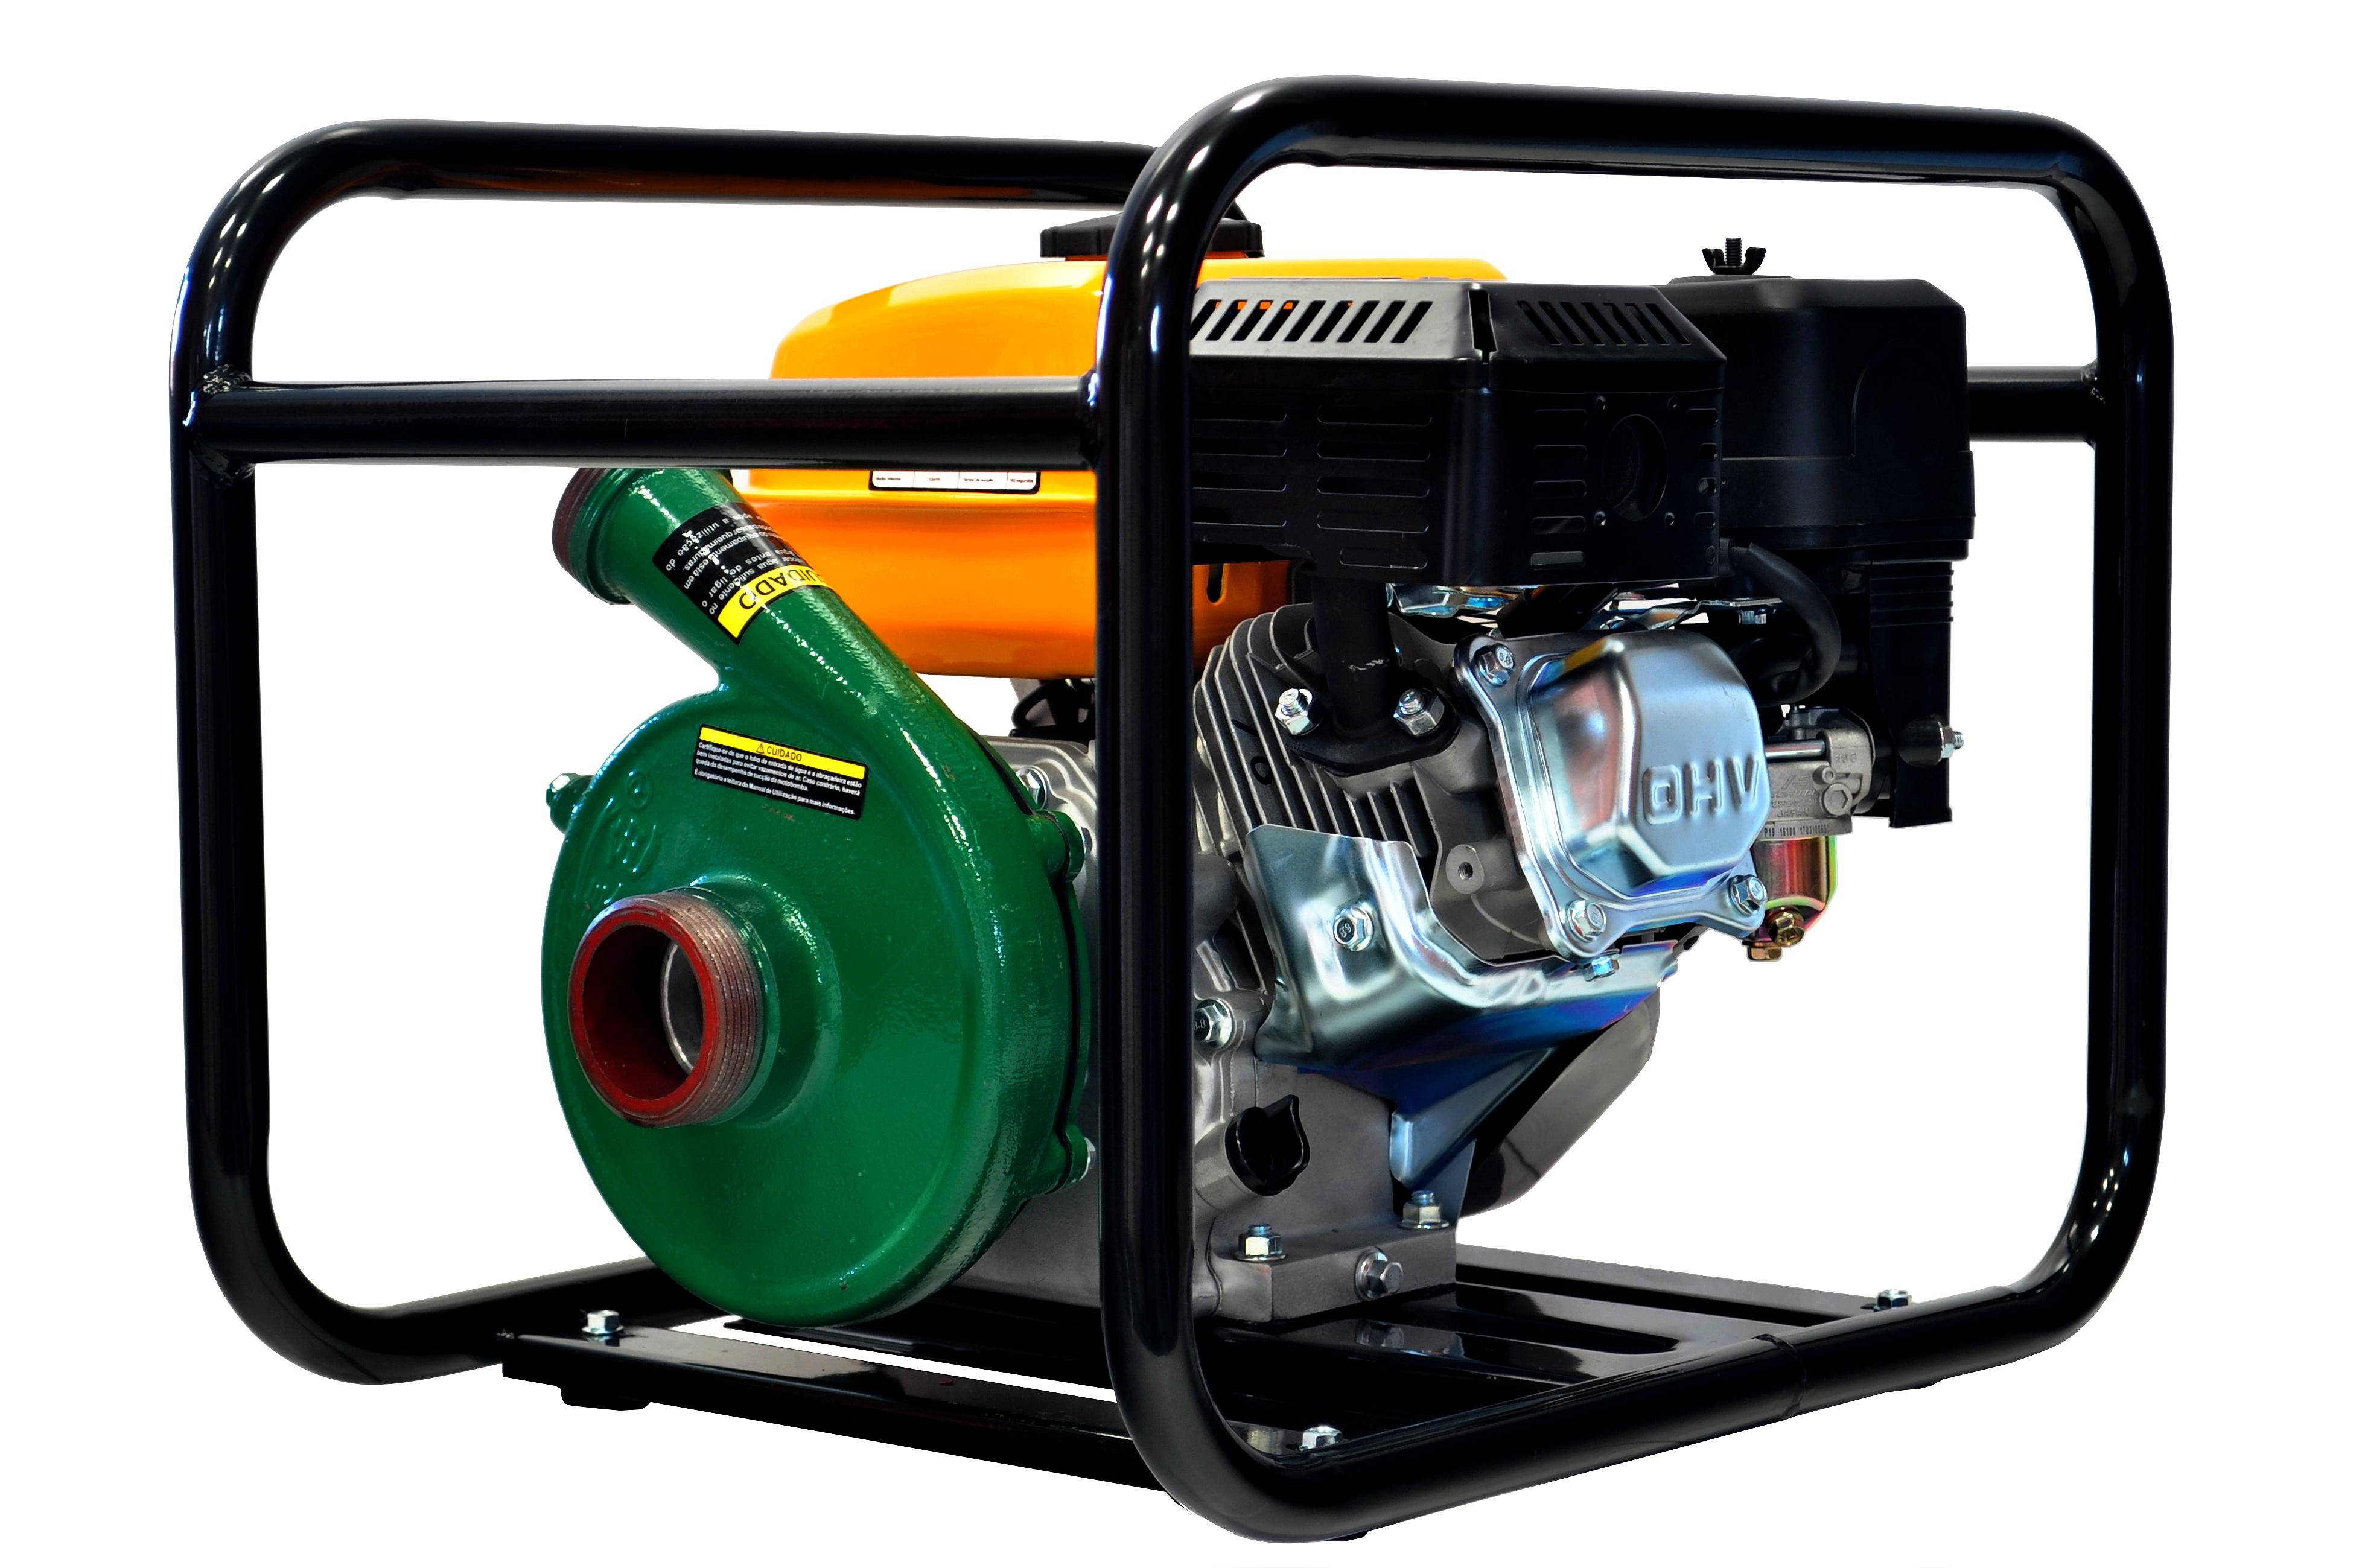 Motobomba a Gasolina - ZB25G